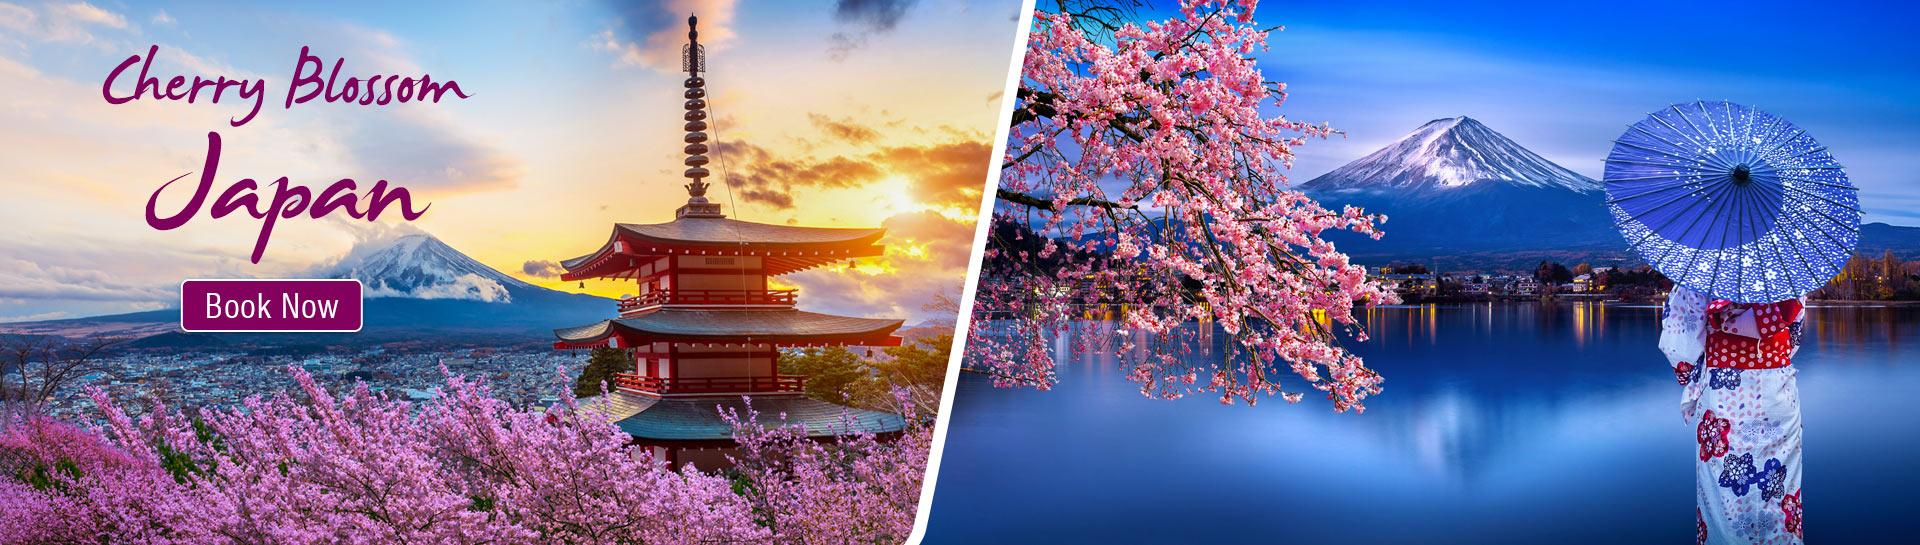 Cherry Blosssom Japan